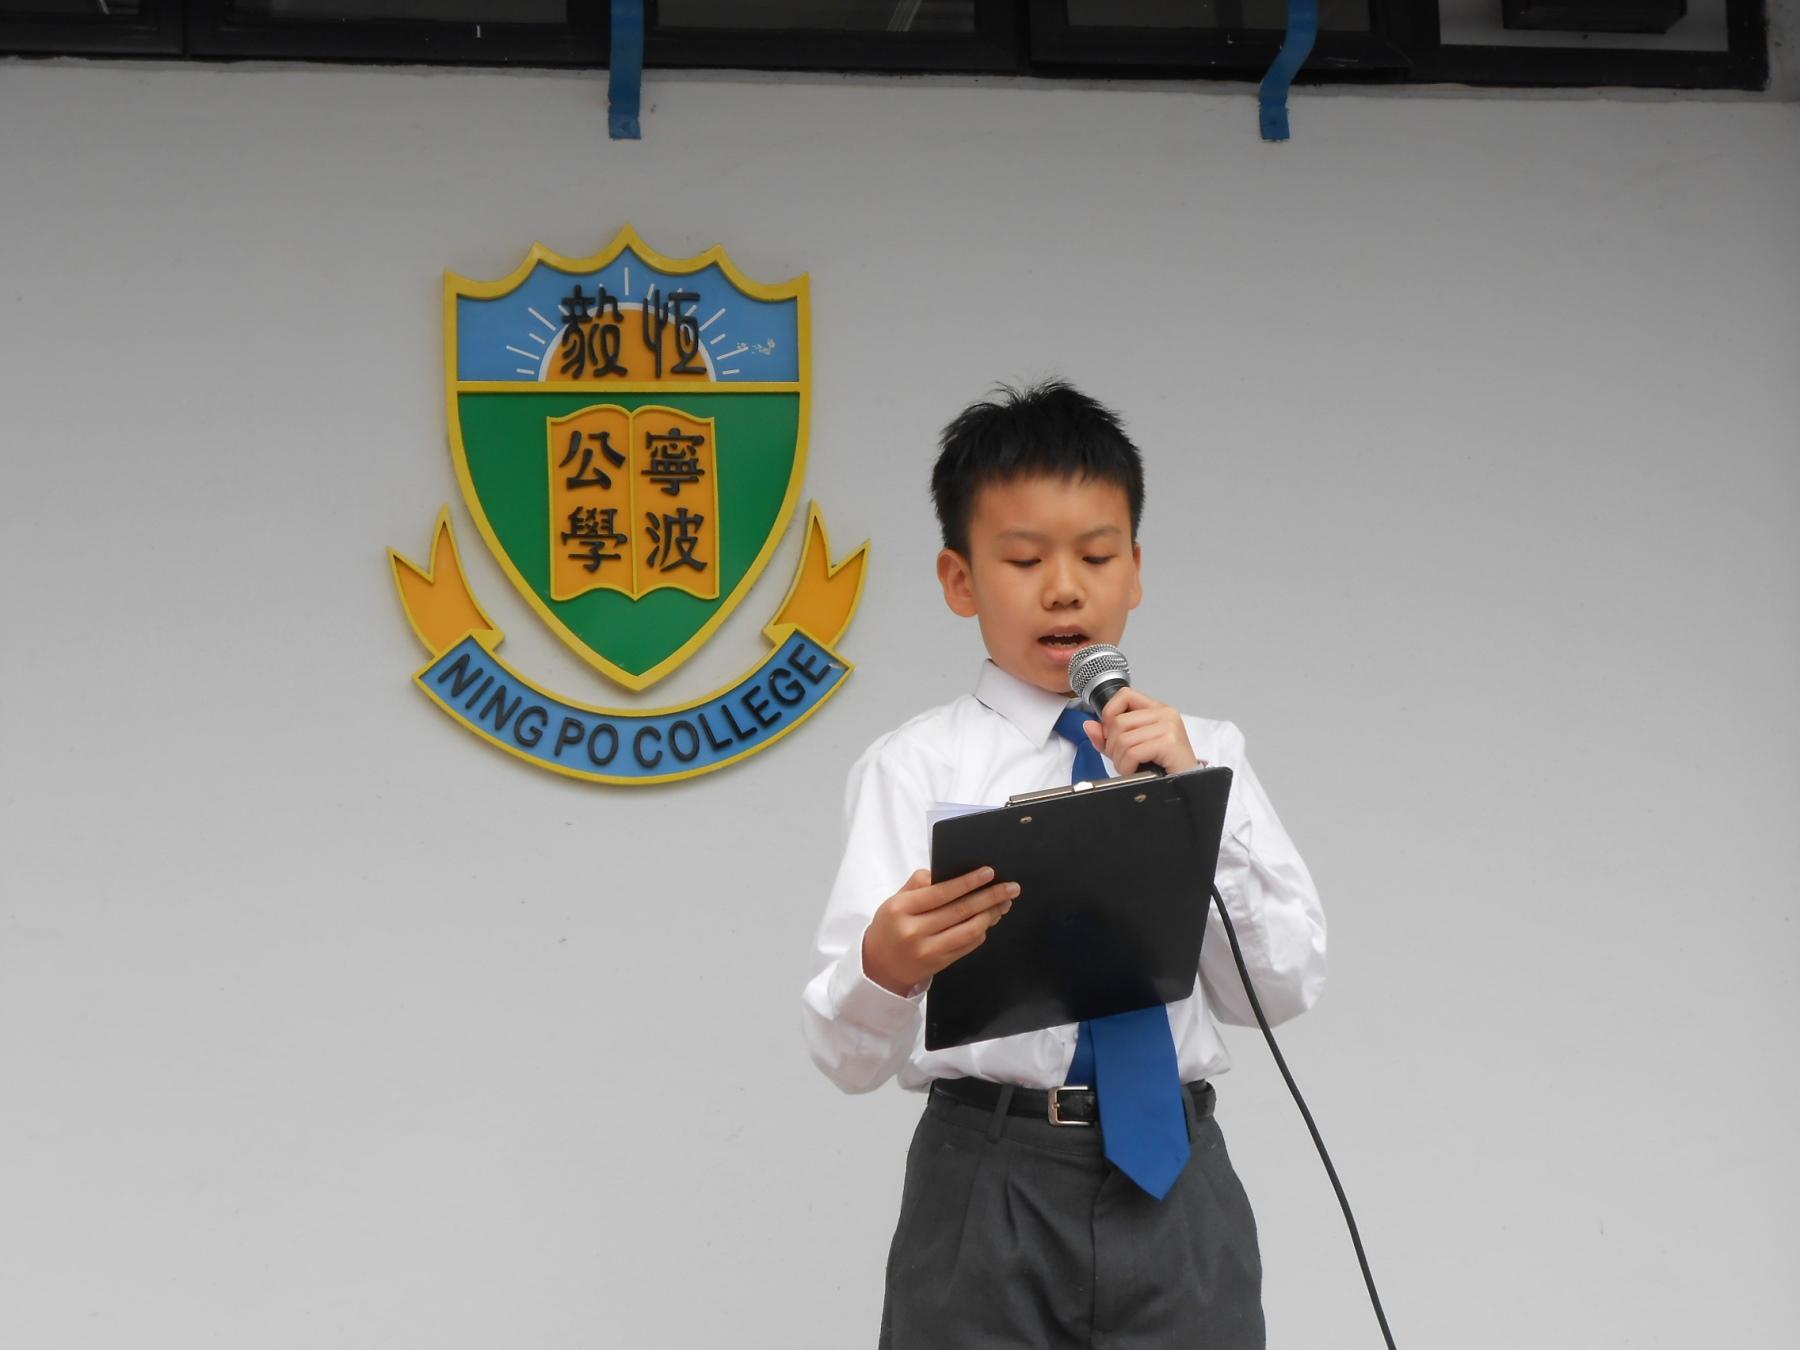 http://npc.edu.hk/sites/default/files/dscn9452.jpg